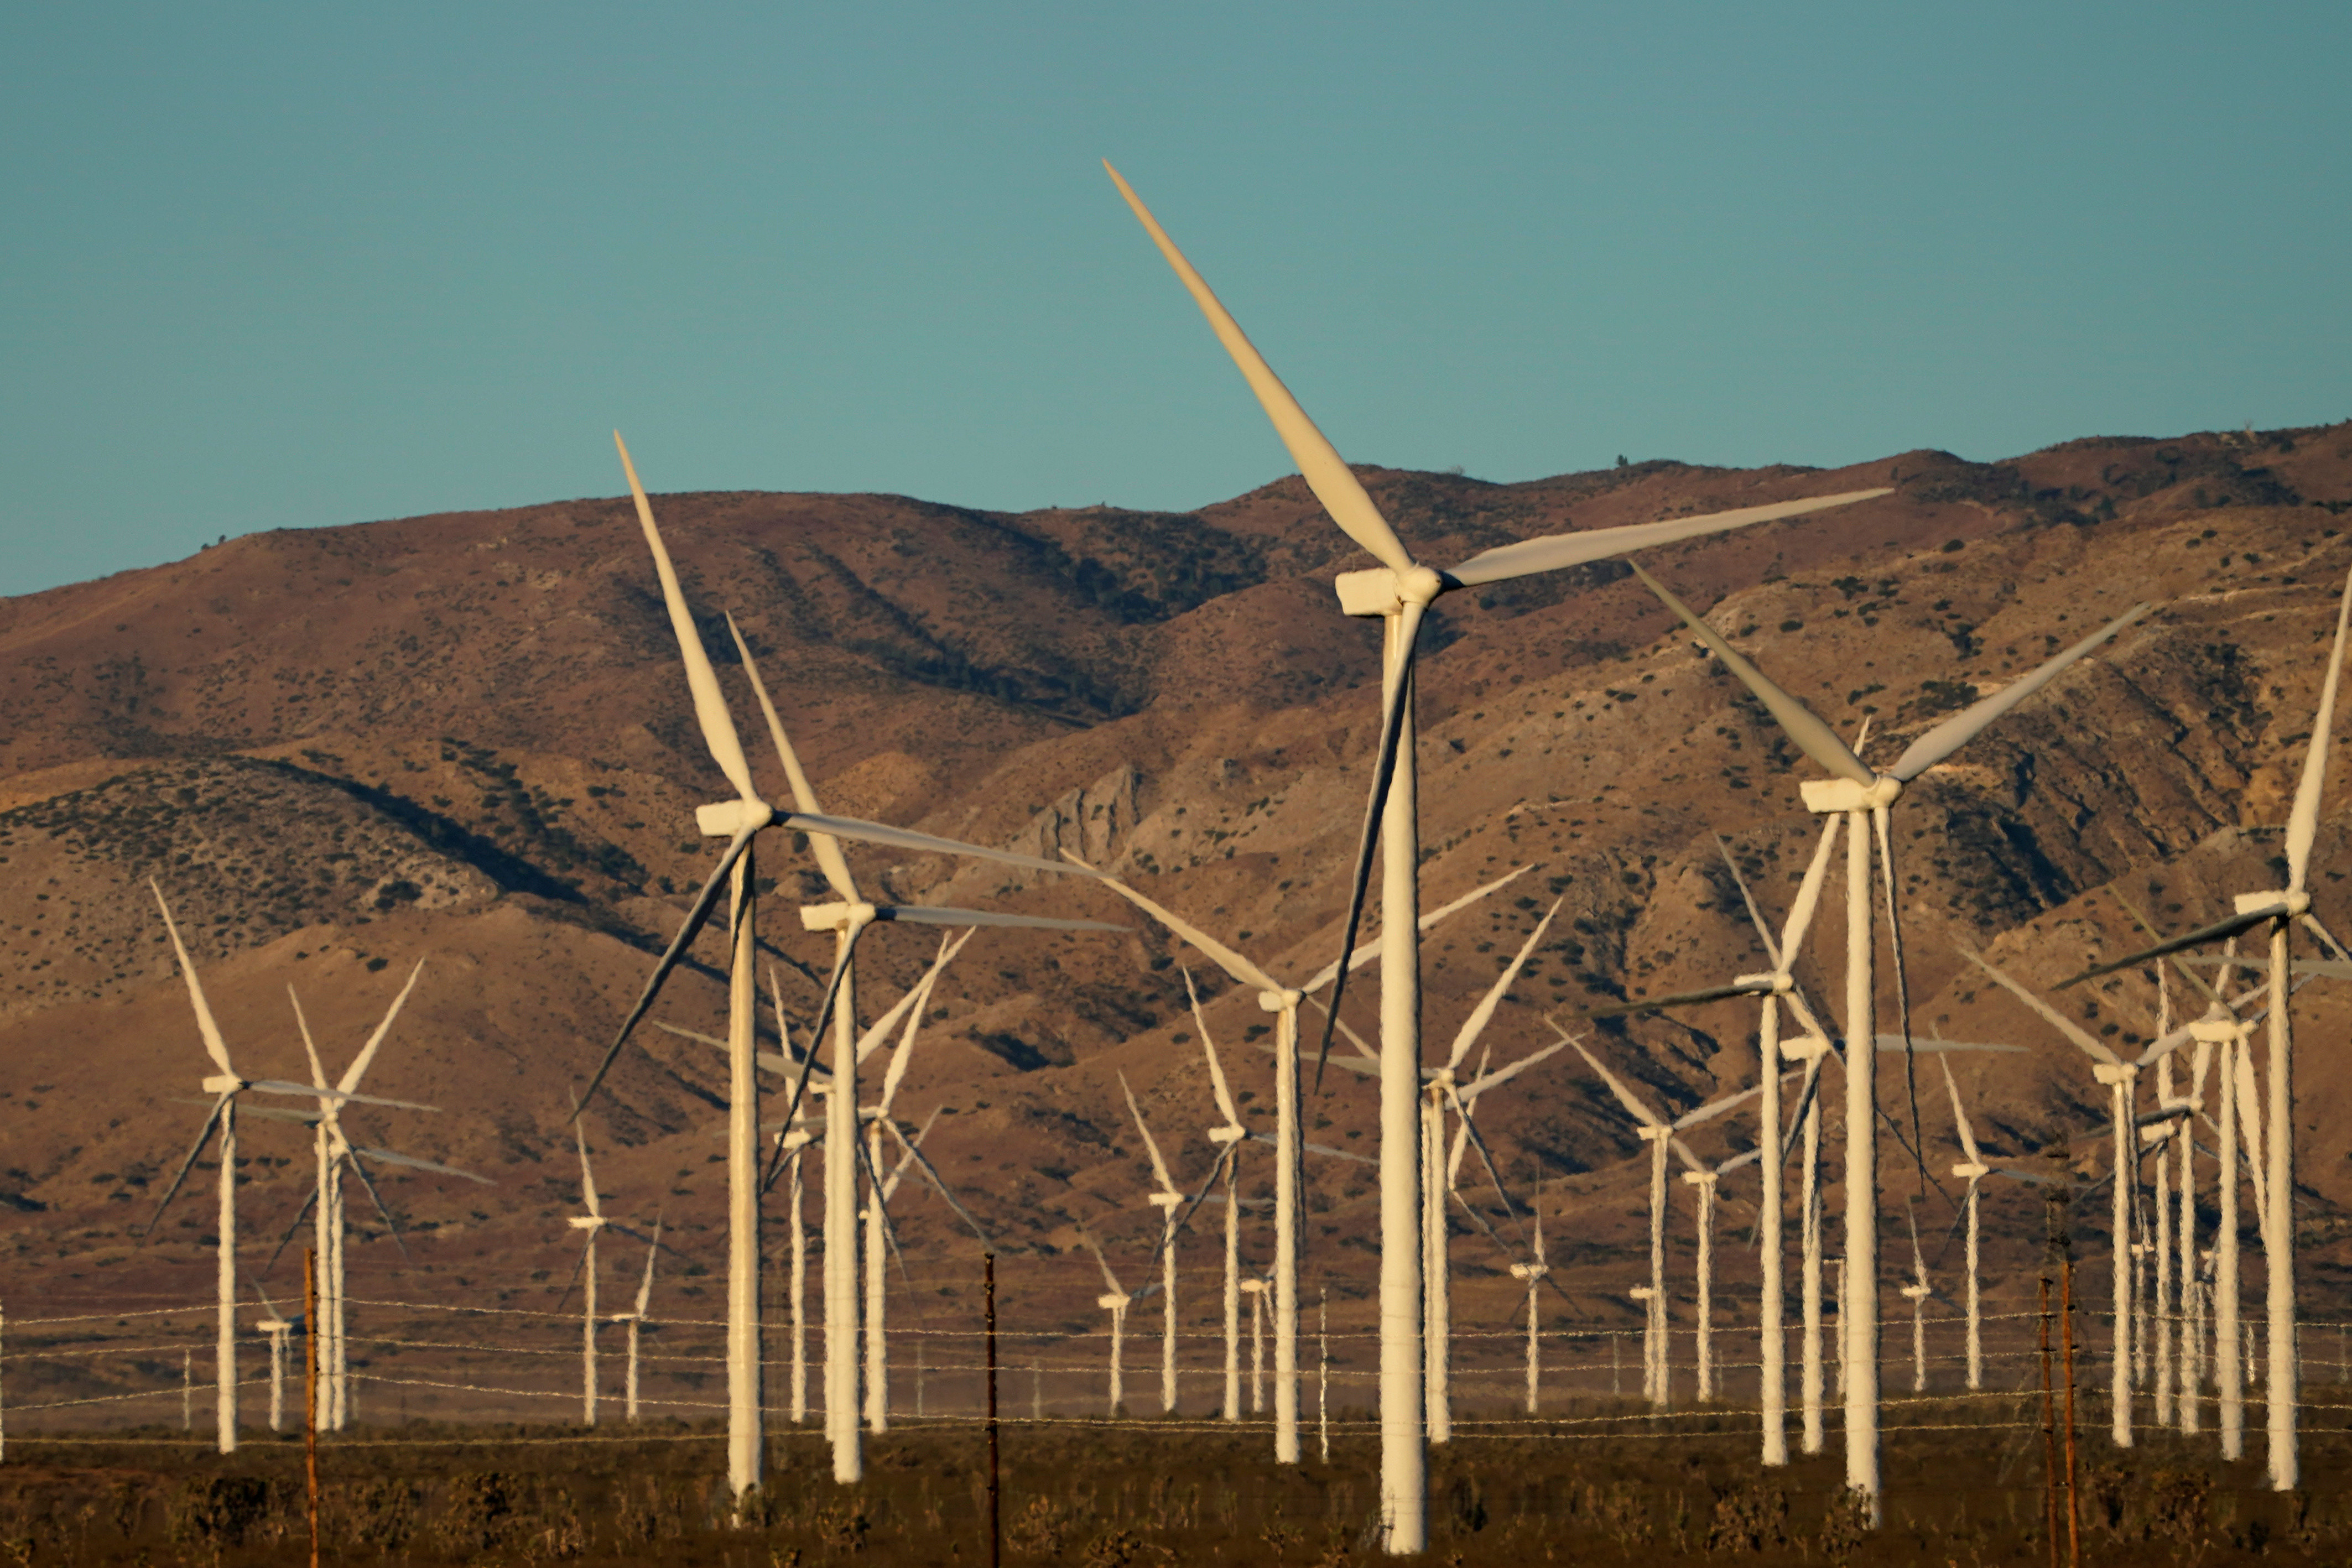 A wind farm is shown in Movave, California, U.S., November 8, 2019.  REUTERS/Mike Blake - RC2E7D9WDU8J